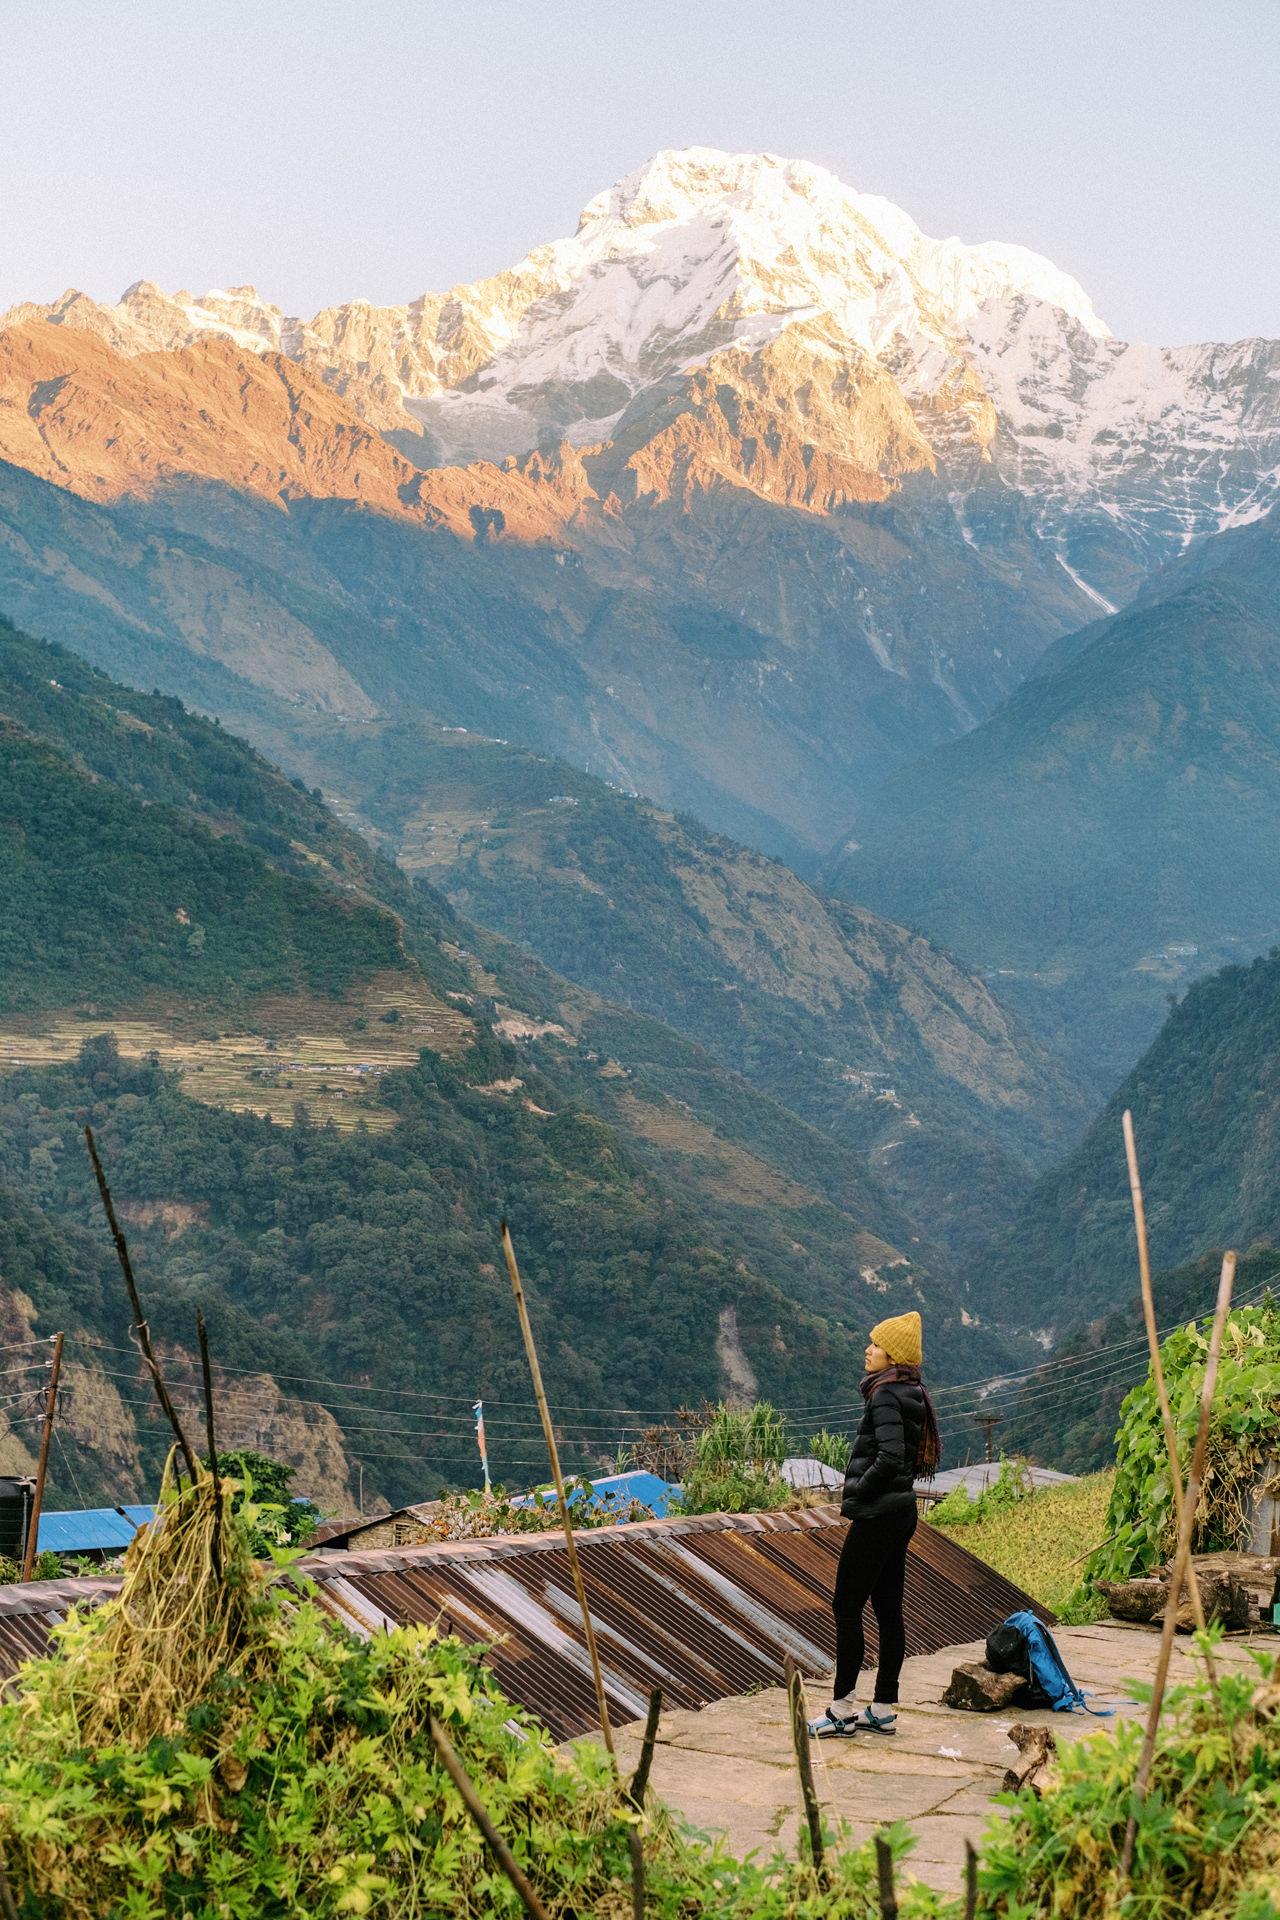 Nepal 2019 - Trekking Annapurna Base Camp 72